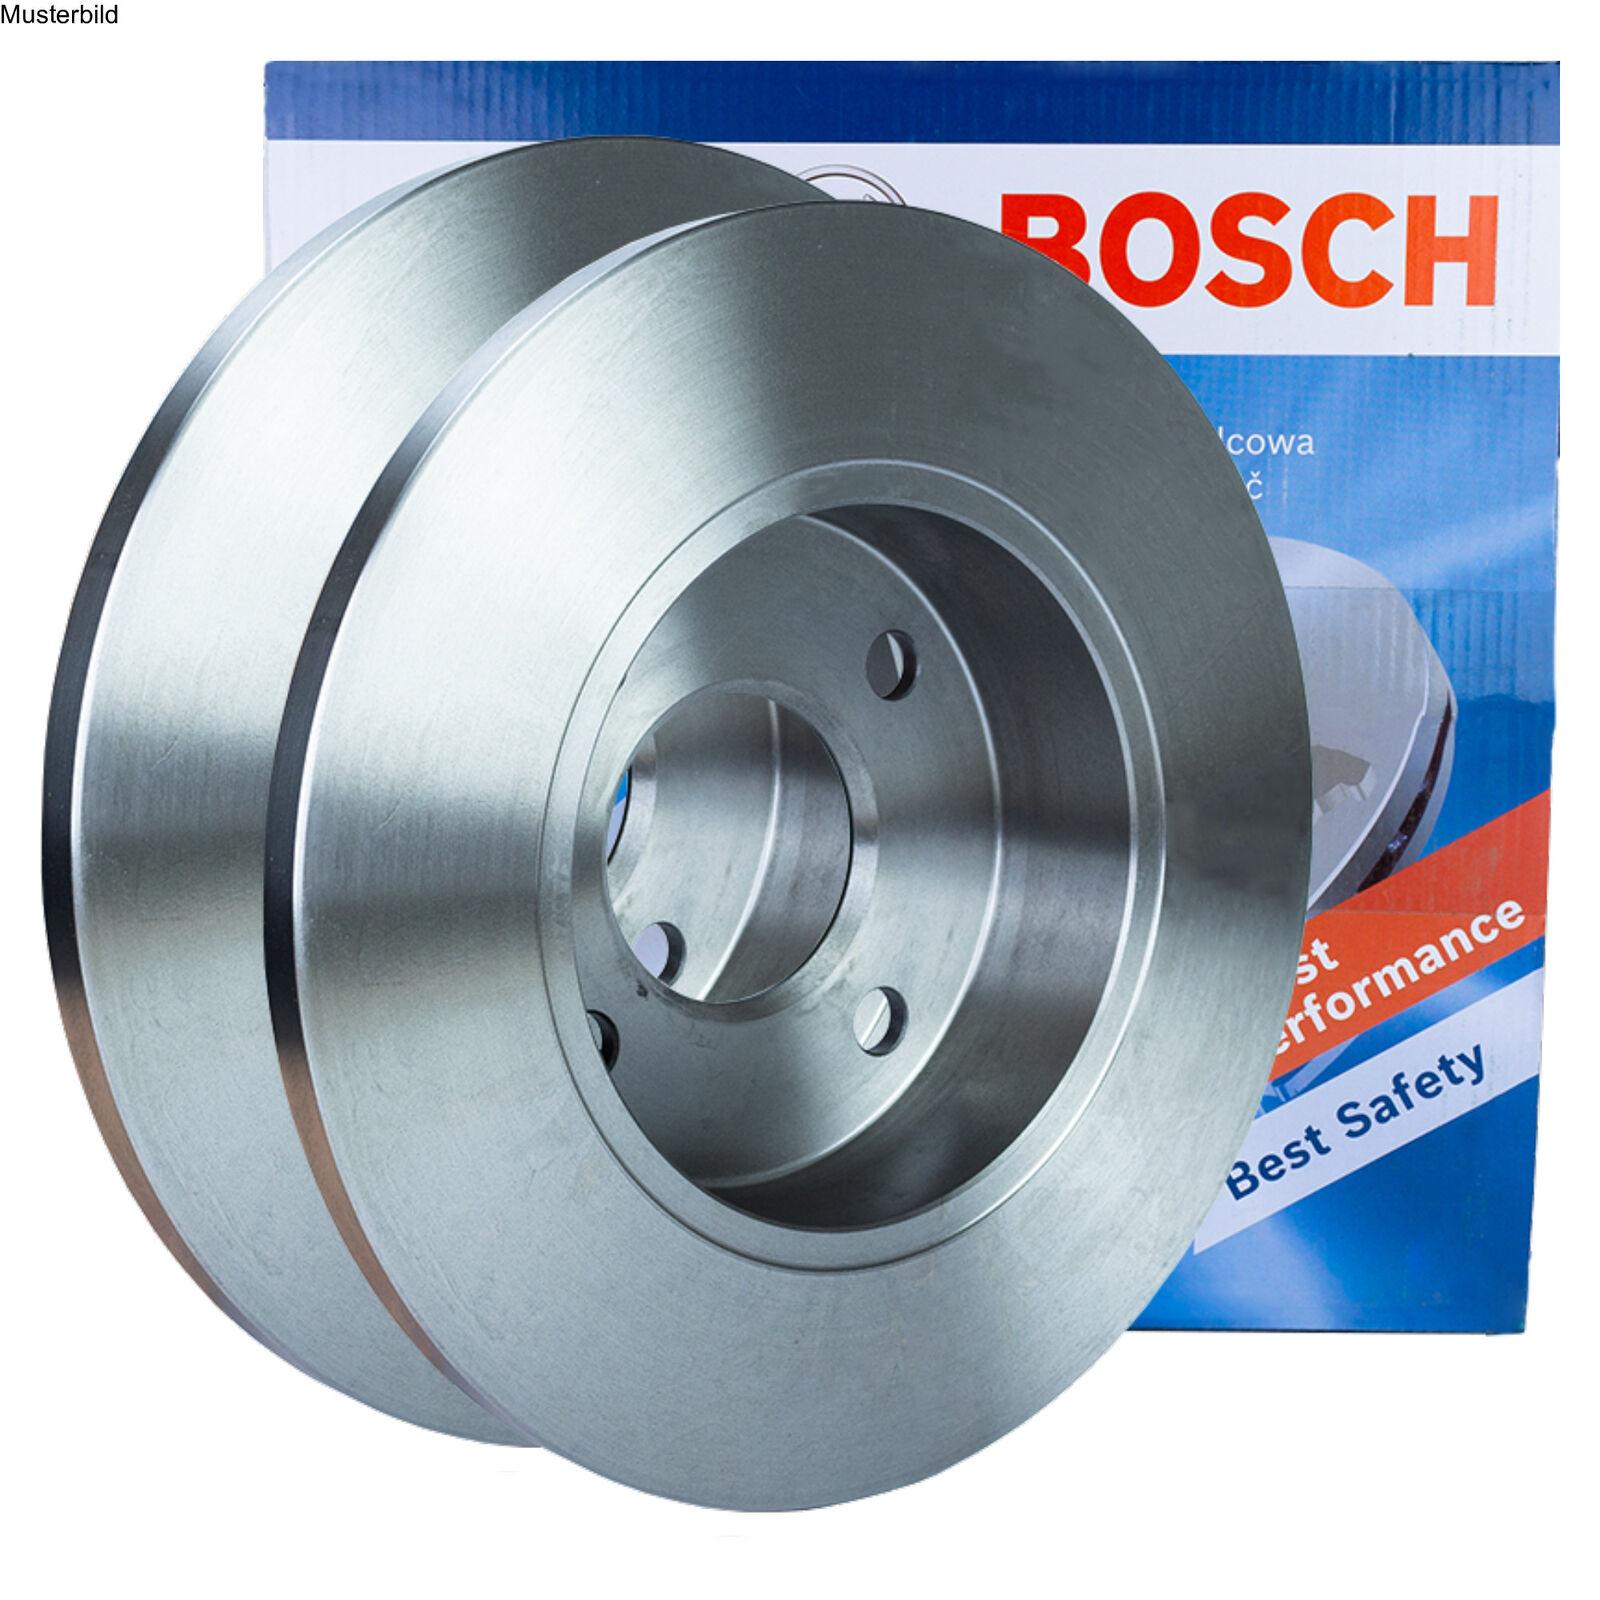 2x BOSCH Bremsscheiben Für VW Caddy 1.9 TDI 4motion 1.4 1.6 2.0 SDi 1.9 TDI